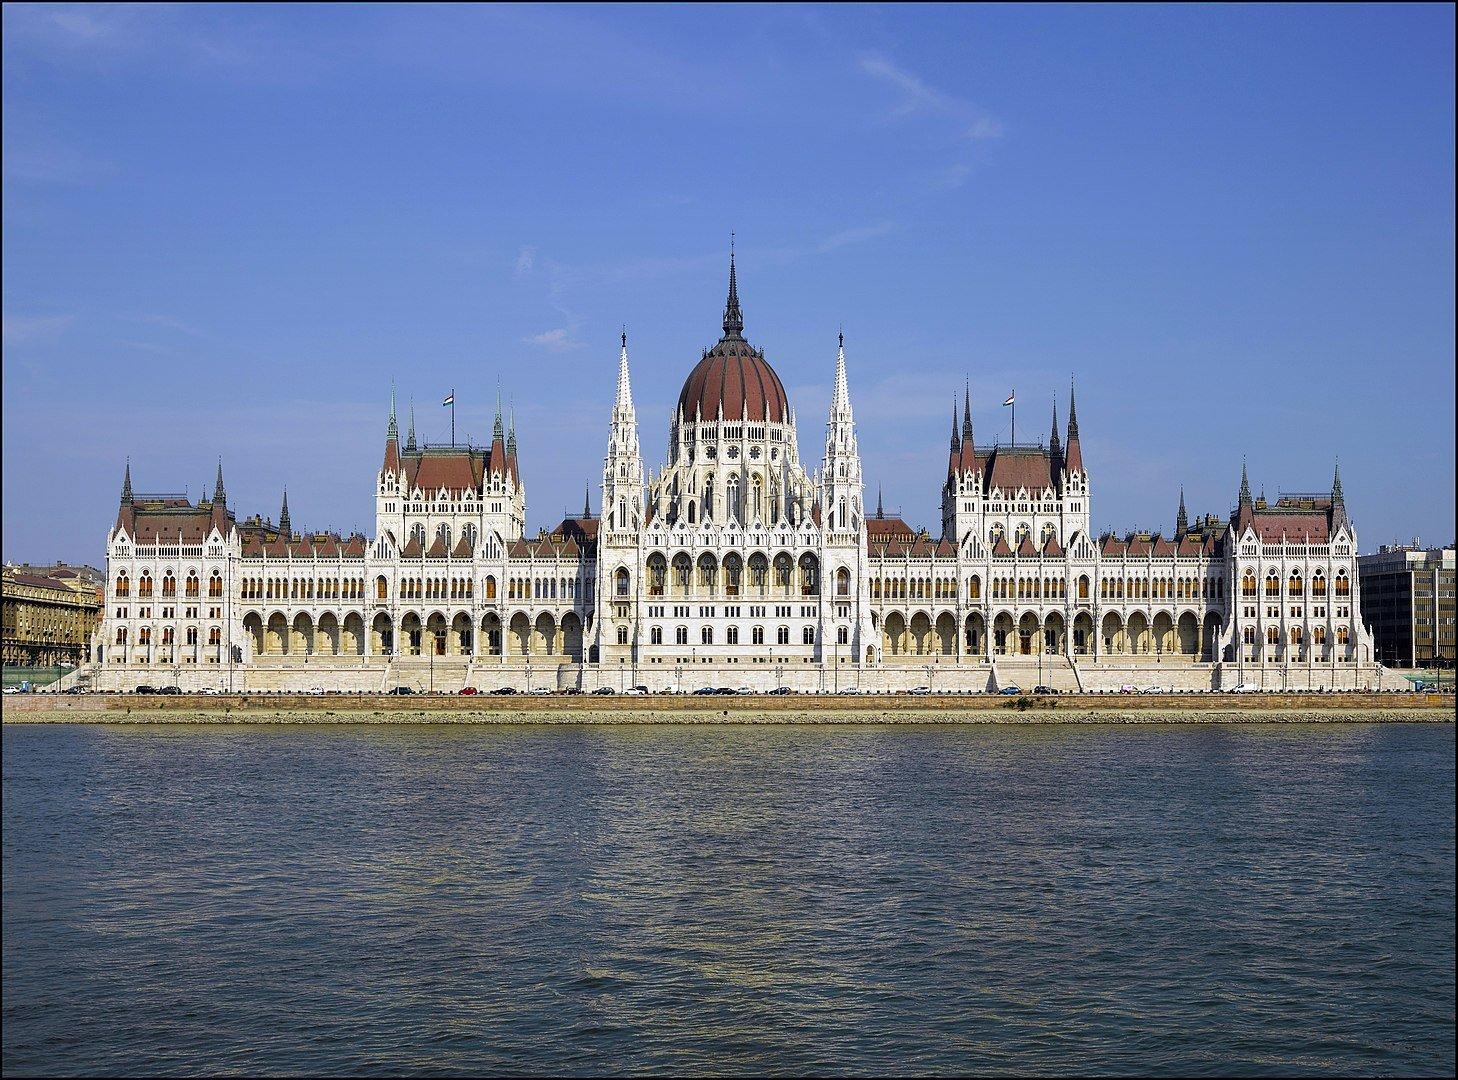 בניים הפרלמנט בודפשט